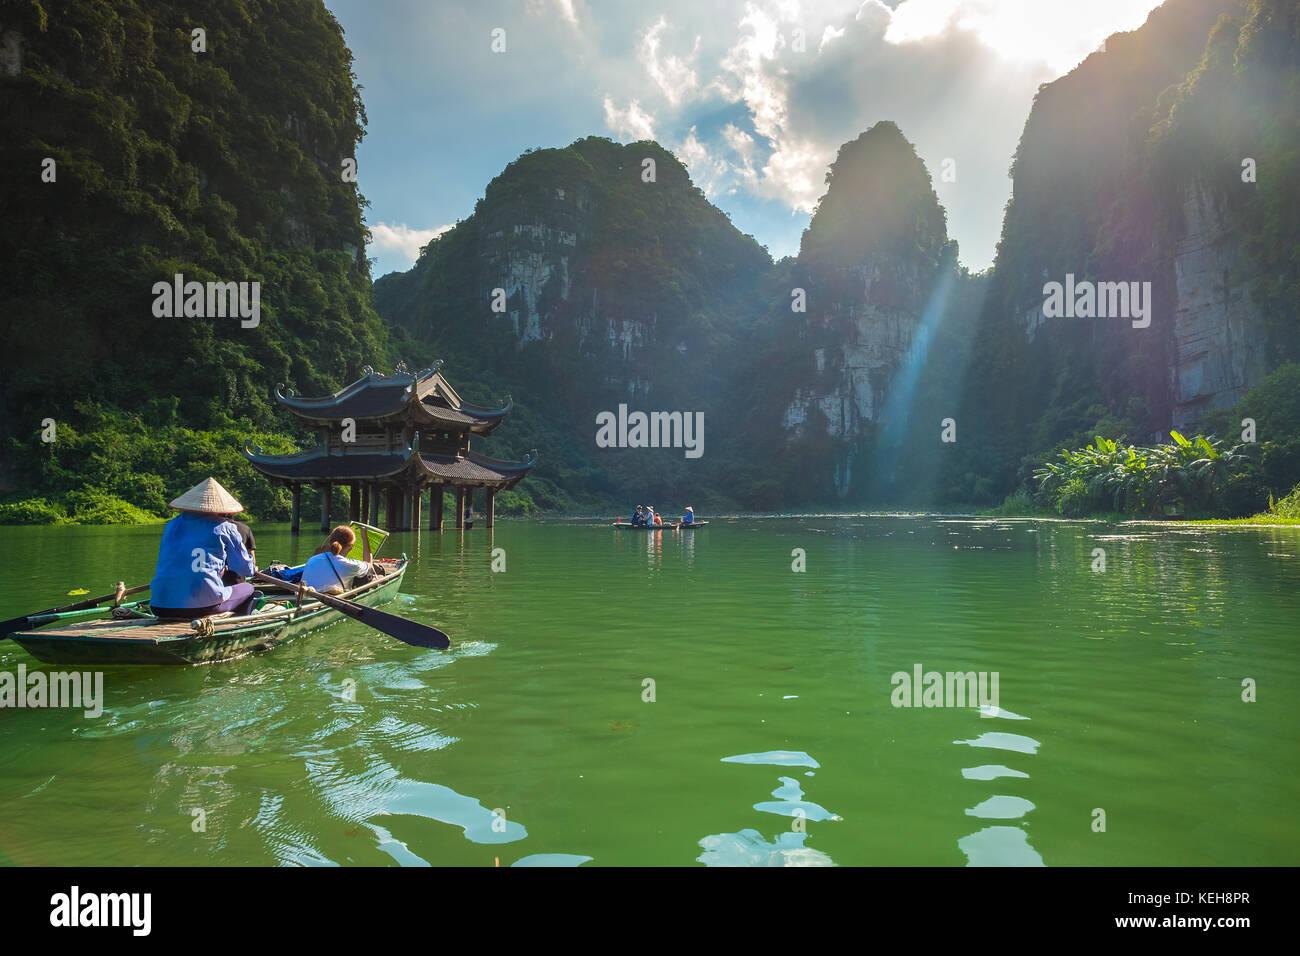 Sep 18, 2017 touristes étrangers ride en bateau local paysage complexe, trang an Ninh Binh, Hanoi, Vietnam Photo Stock